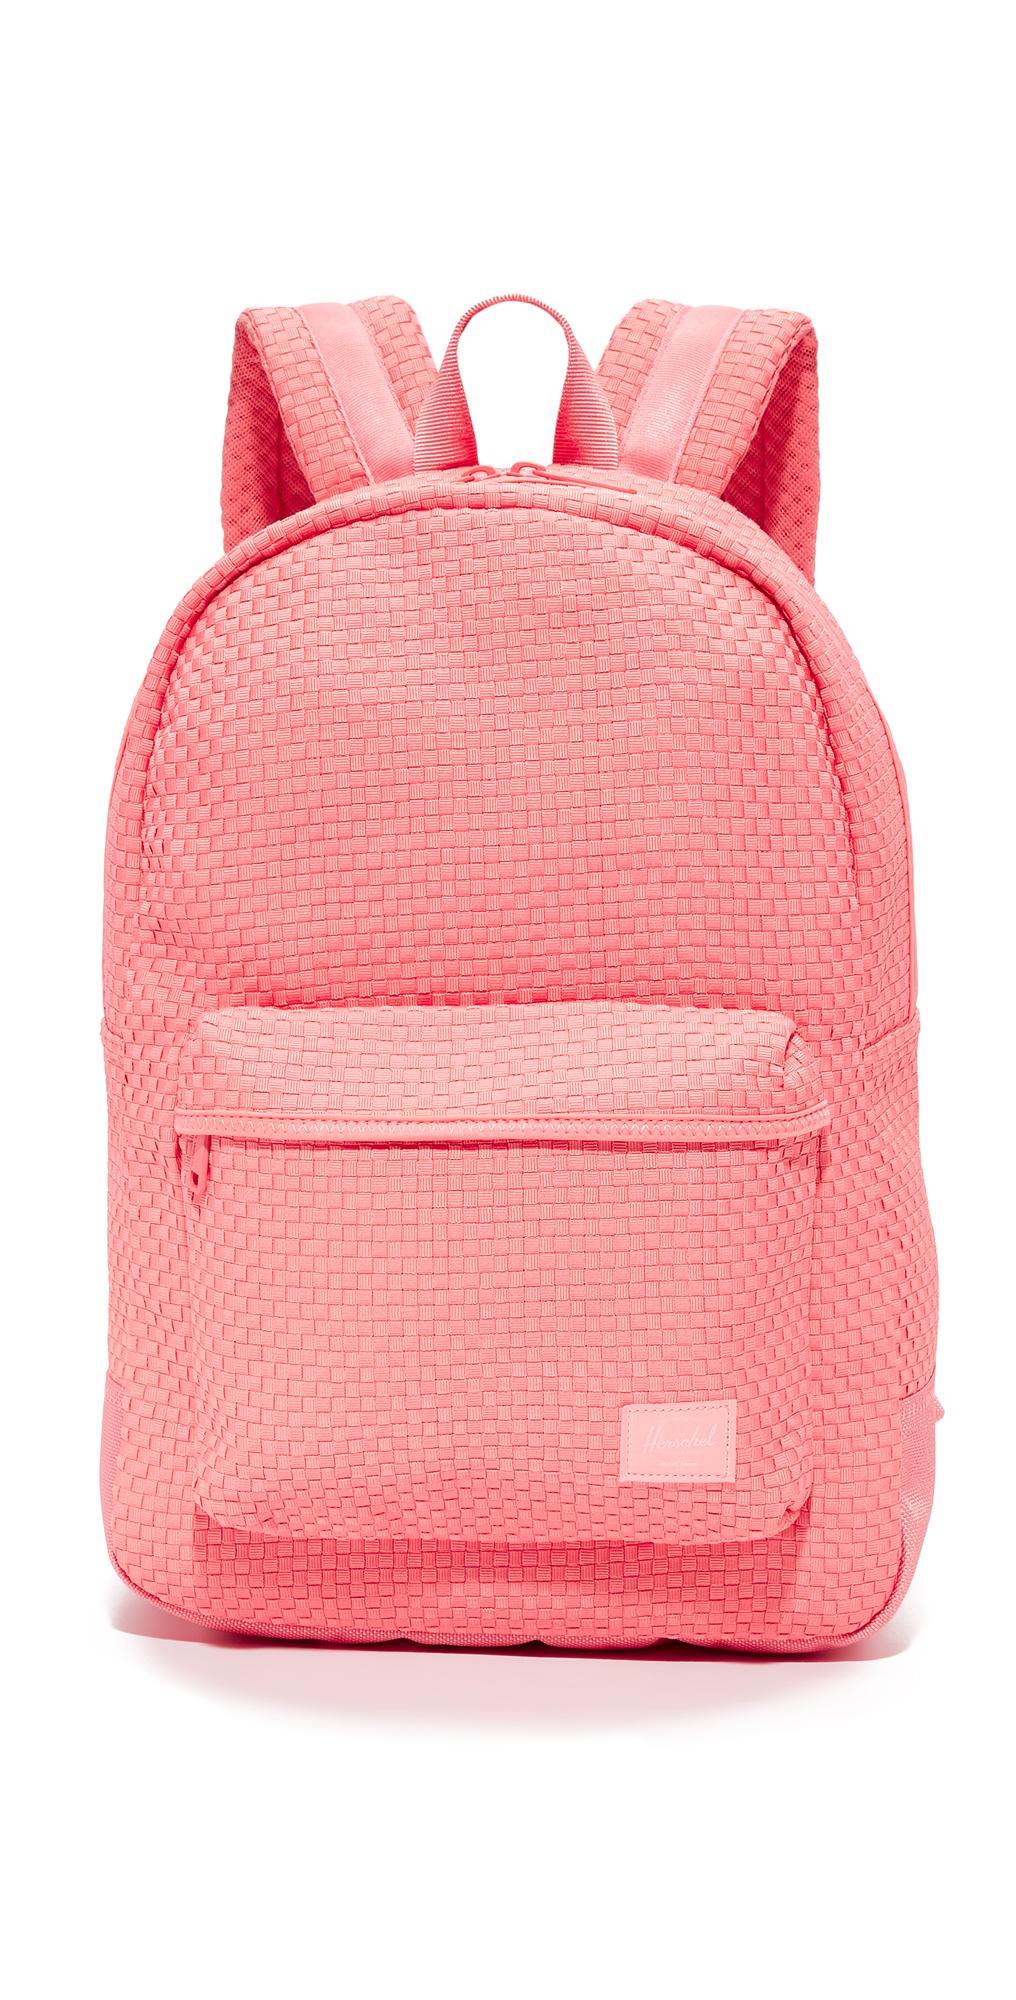 Lawson Backpack Herschel Supply Co.